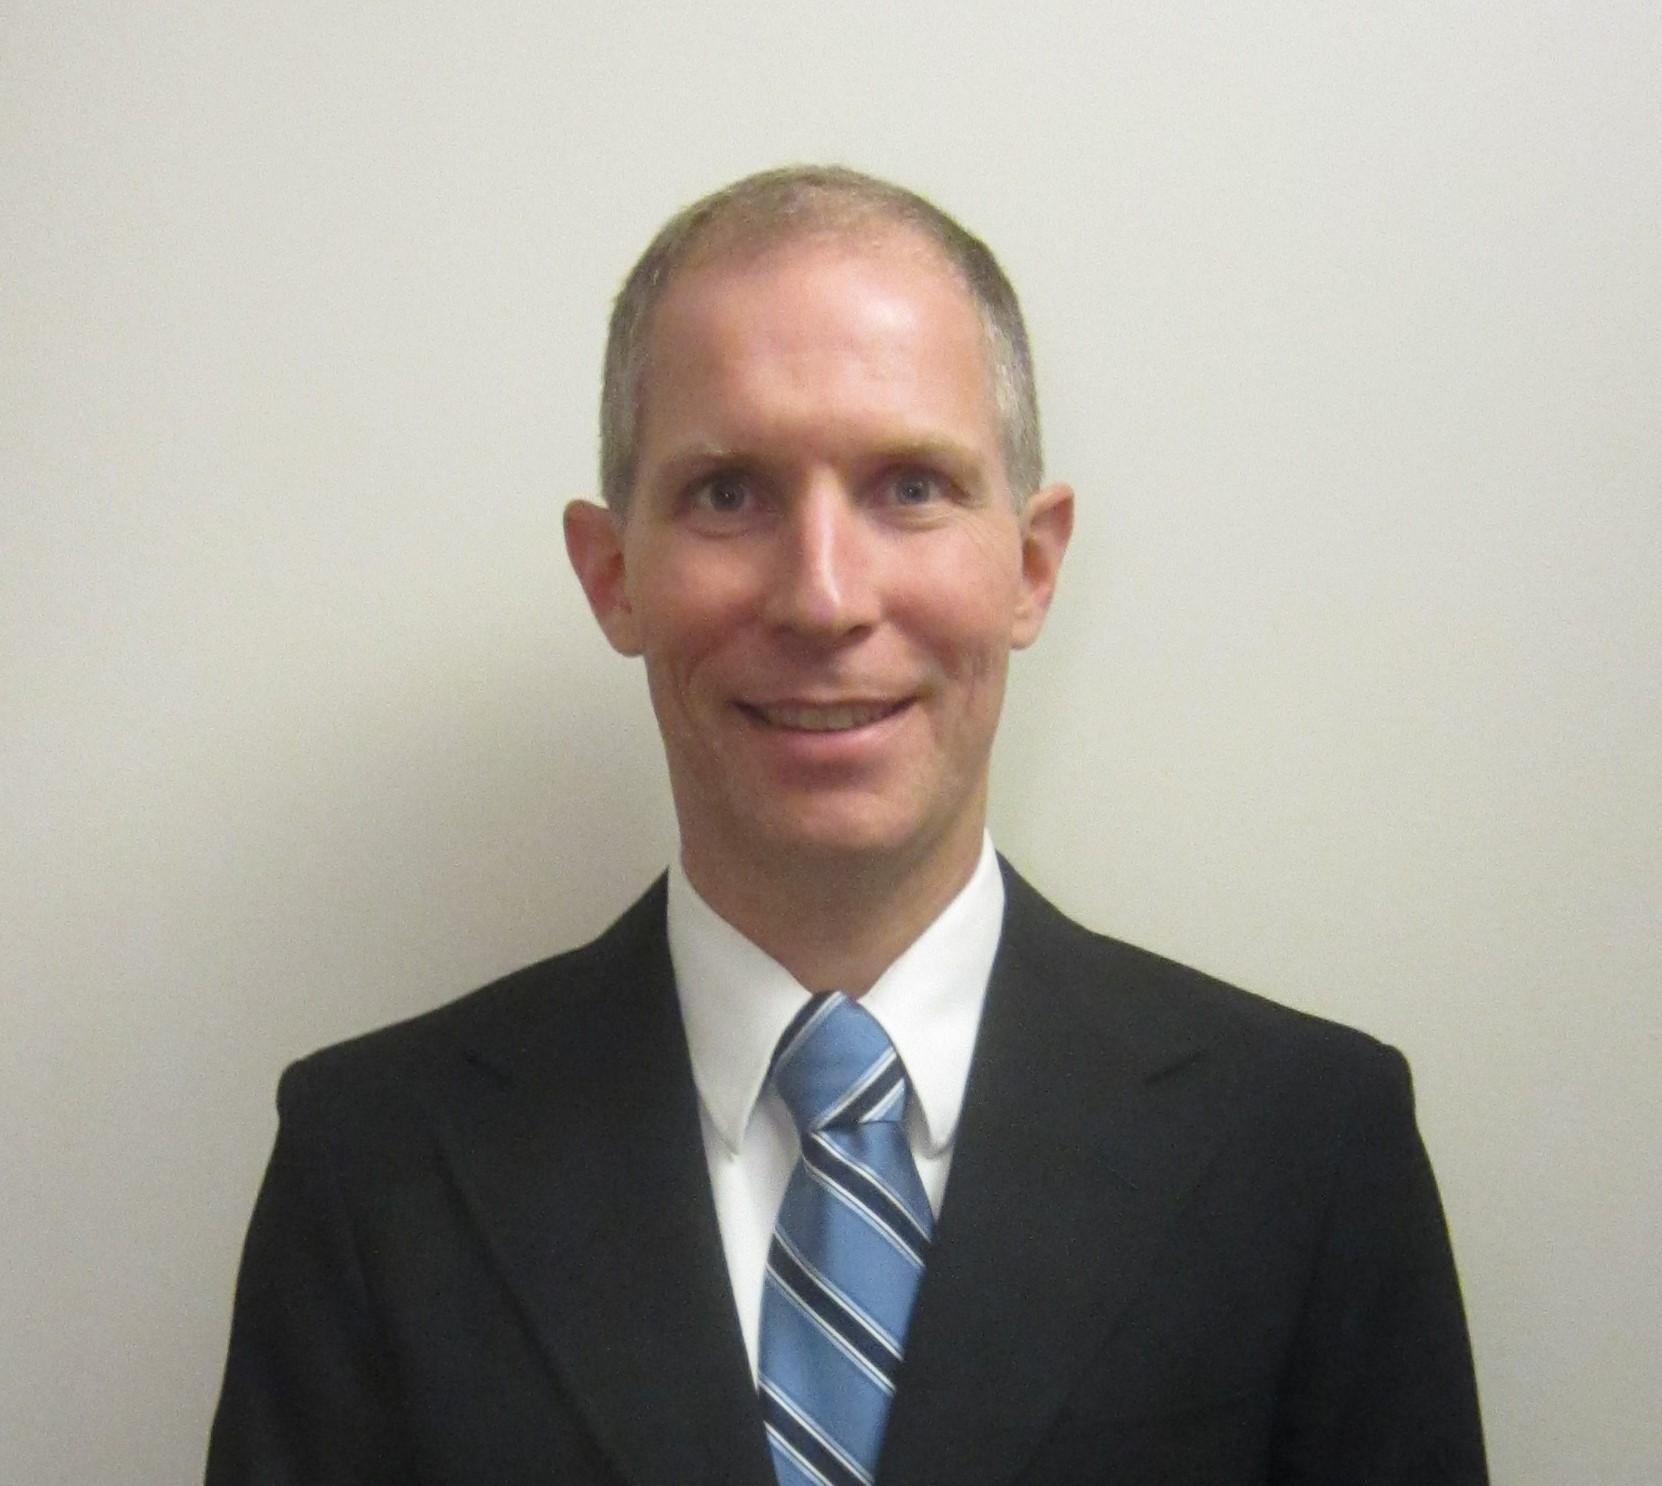 Dallas Bednarczyk, Investigator from Novartis